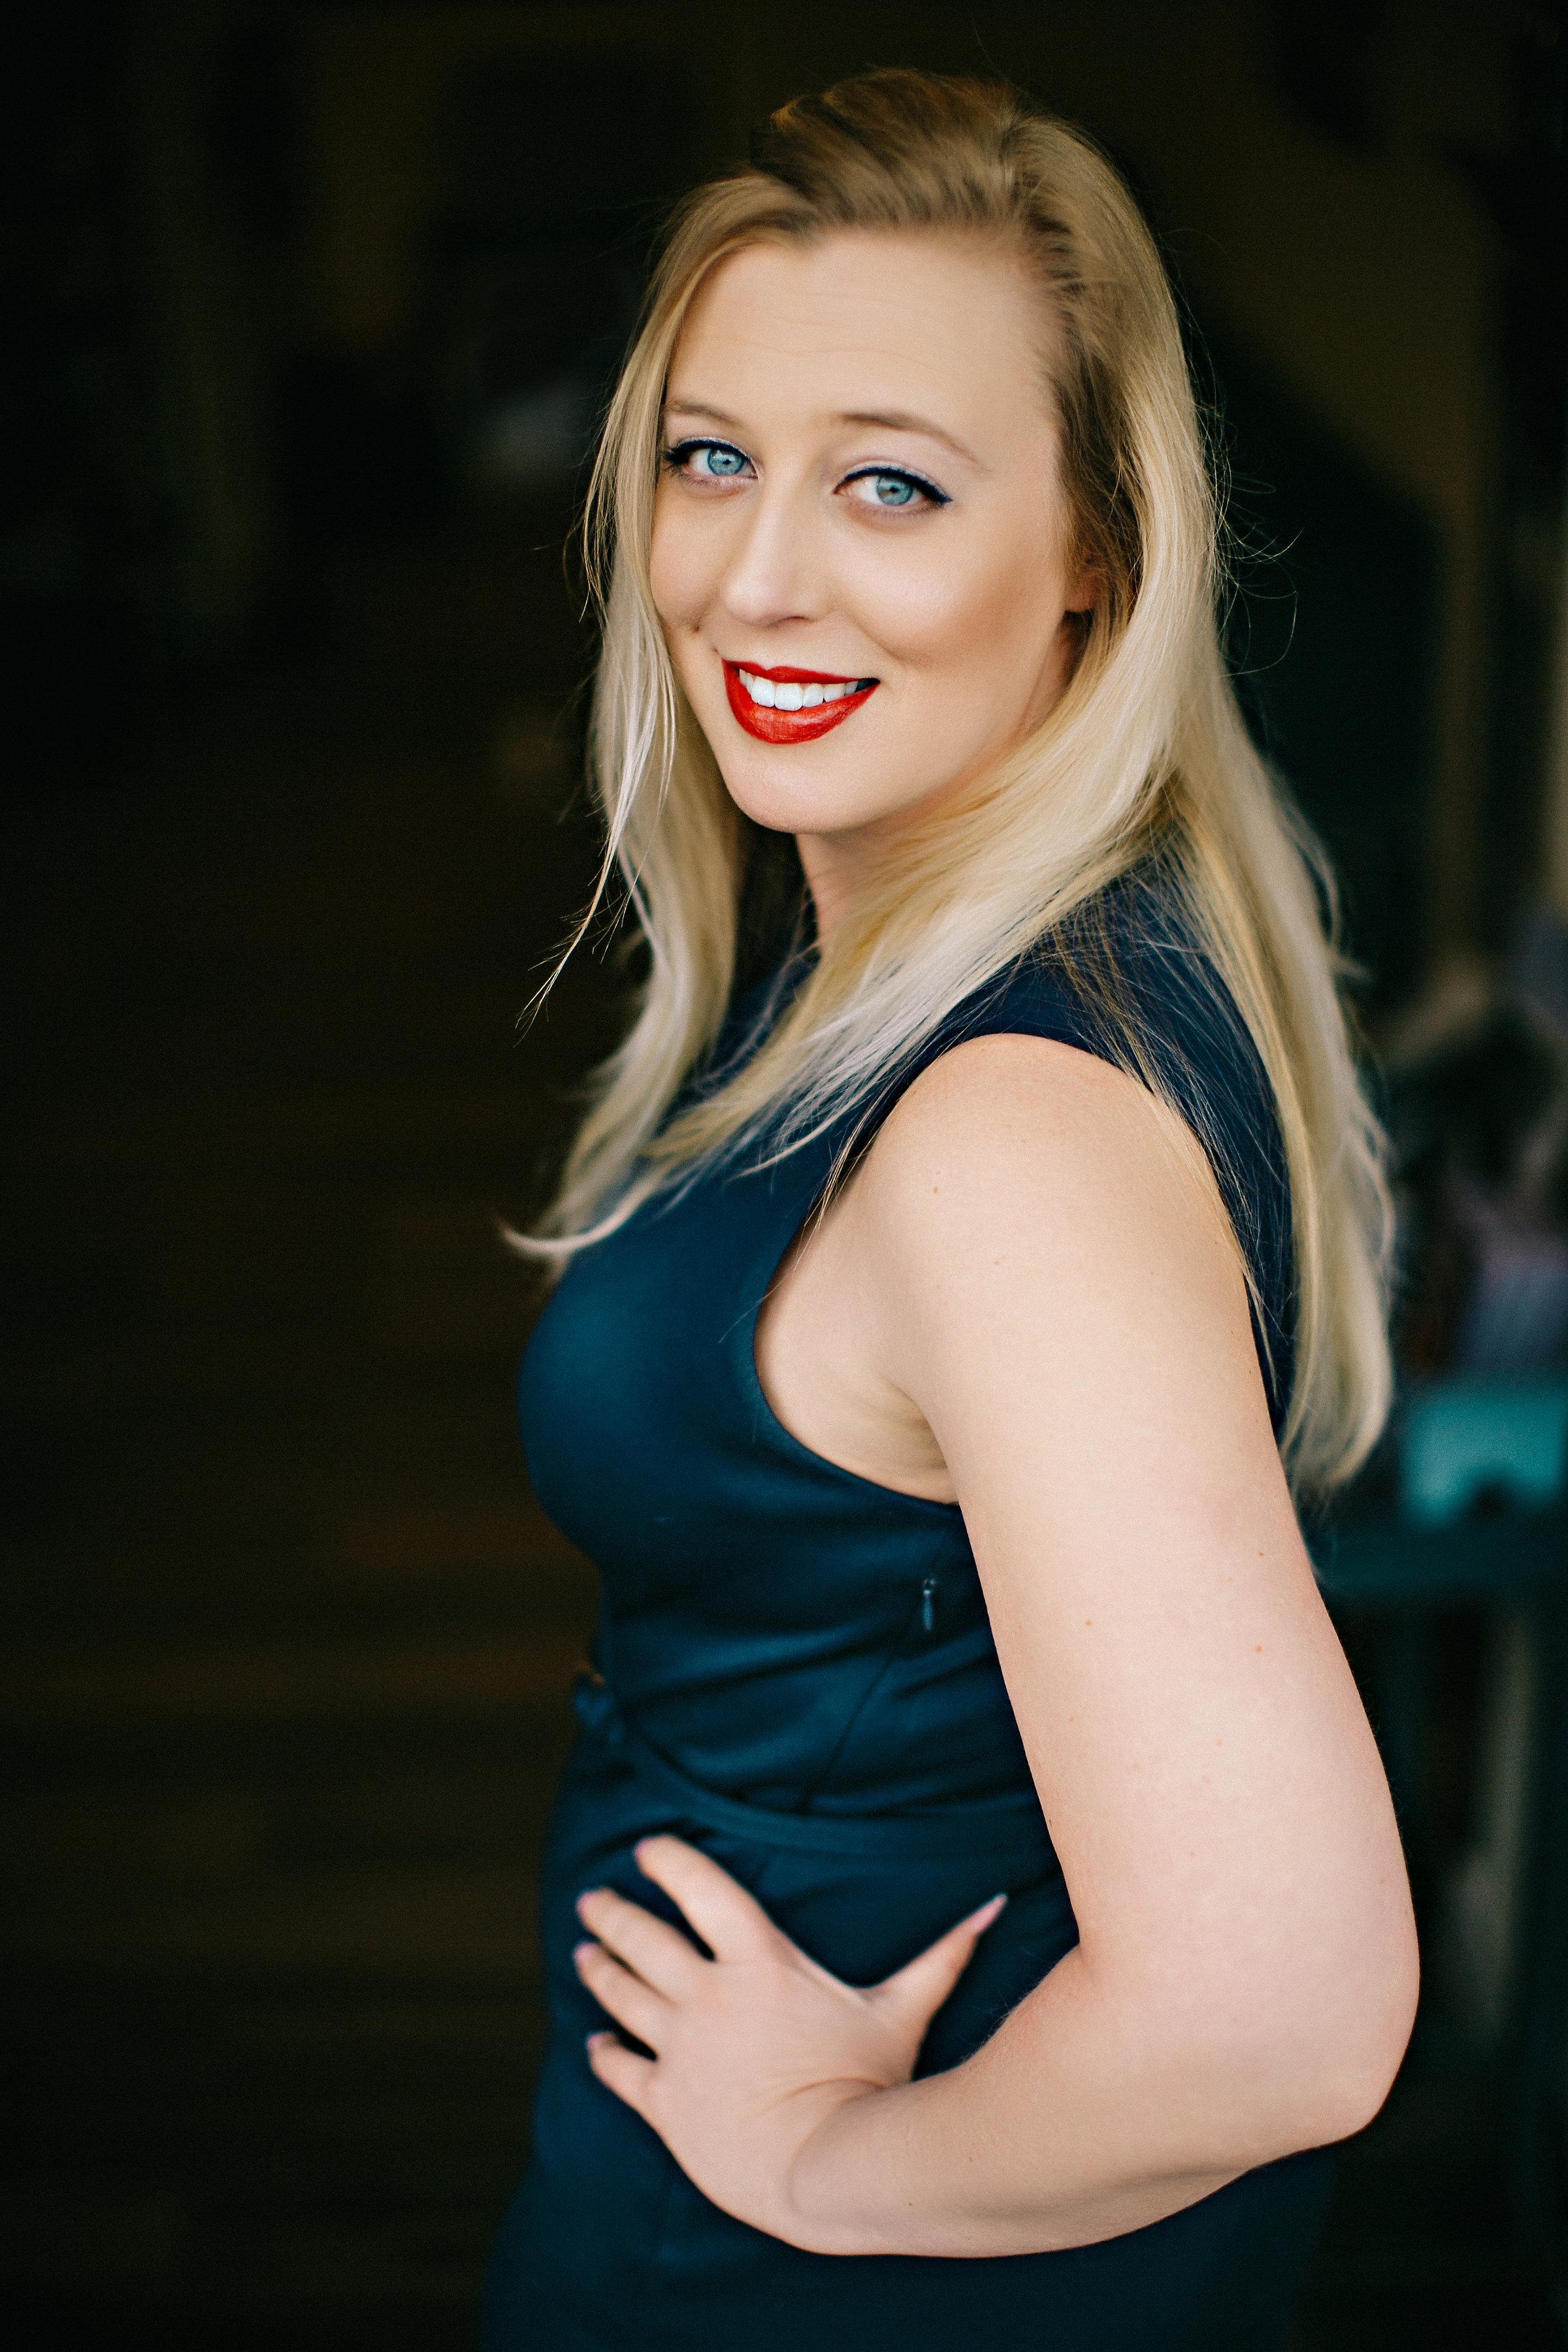 Kimberly Kochem